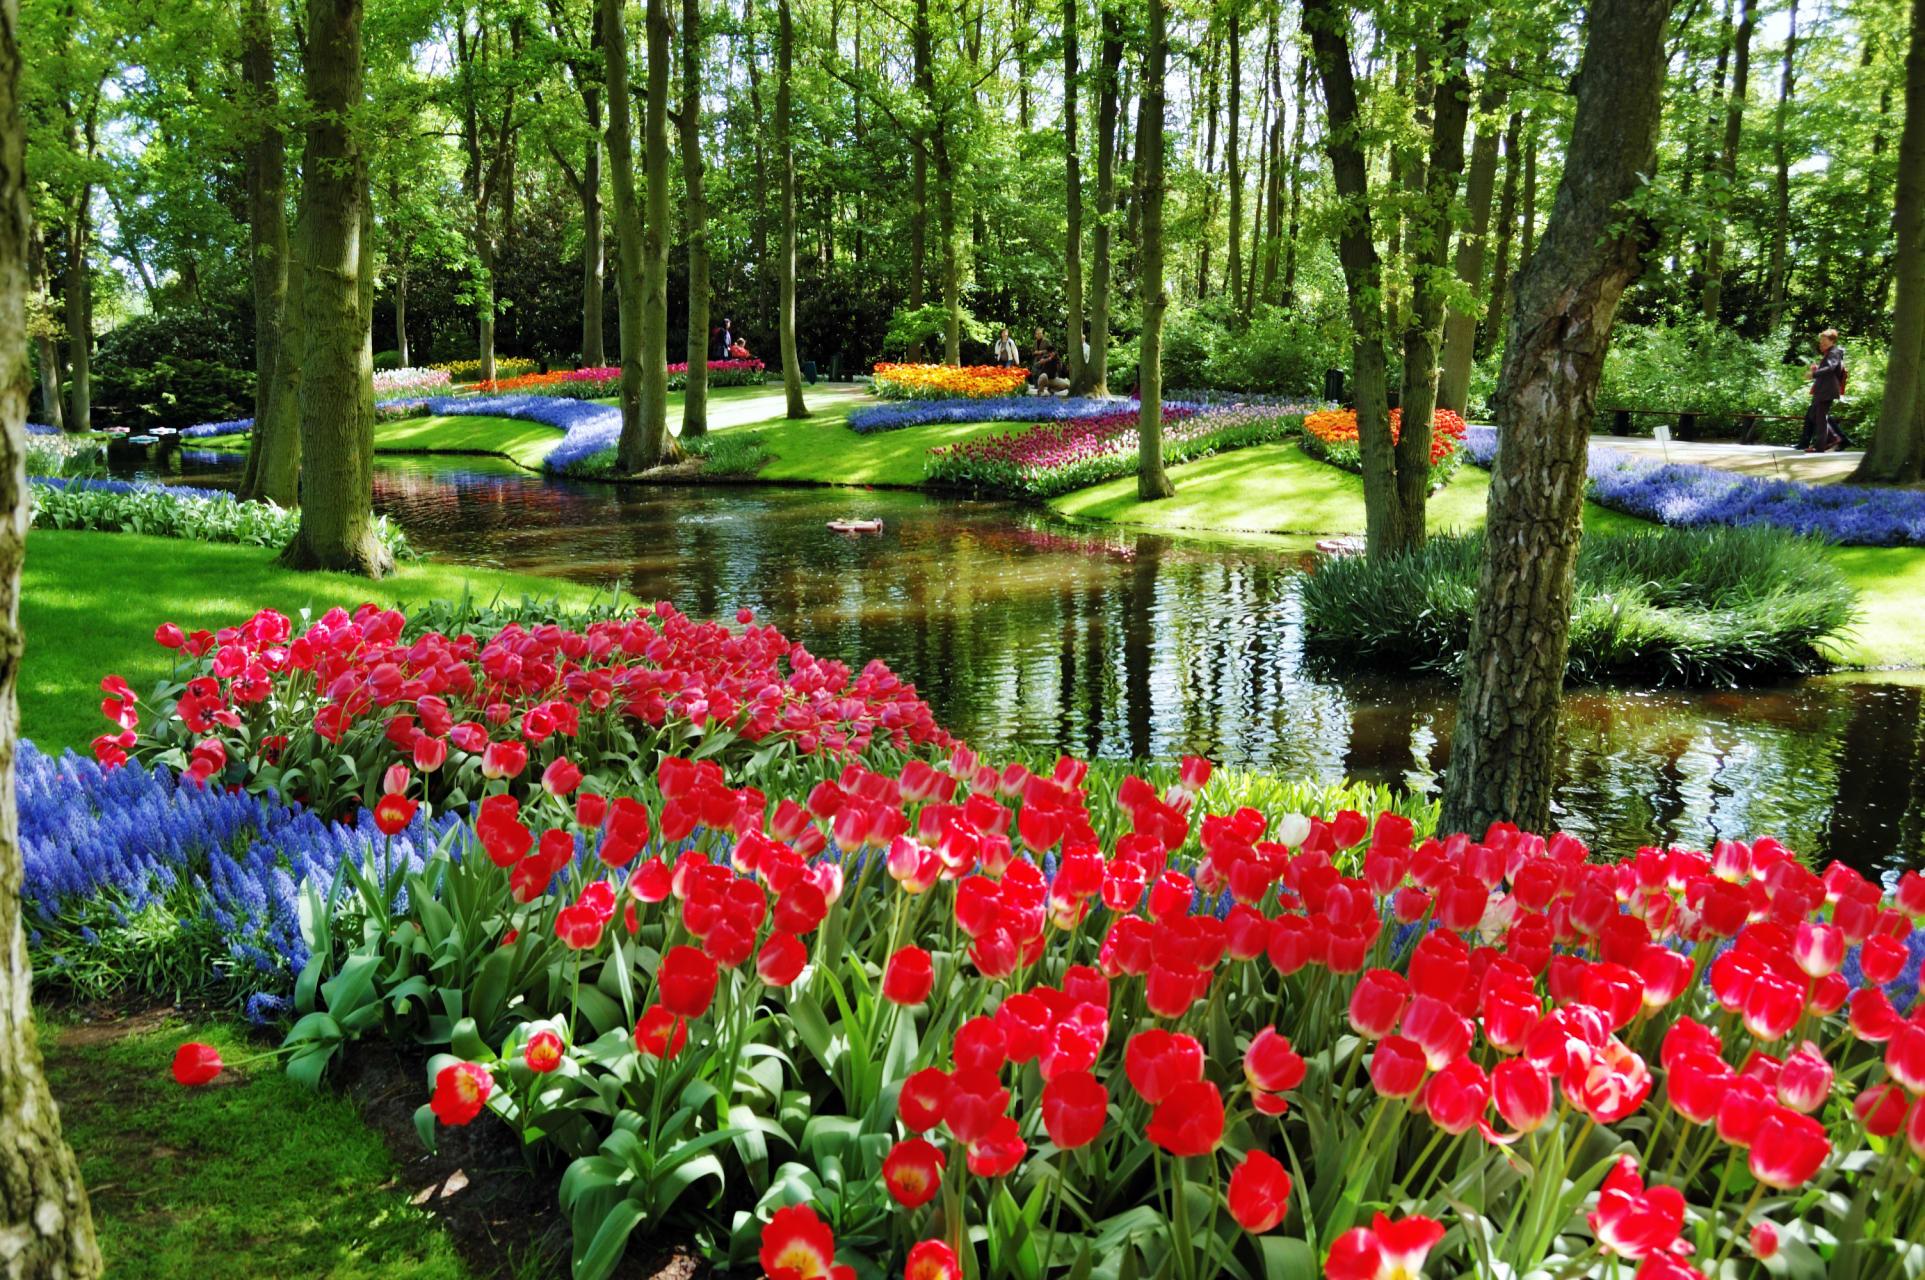 Amsterdam - Keukenhof Gardens and the Extraordinary Story of the Dutch Tulip